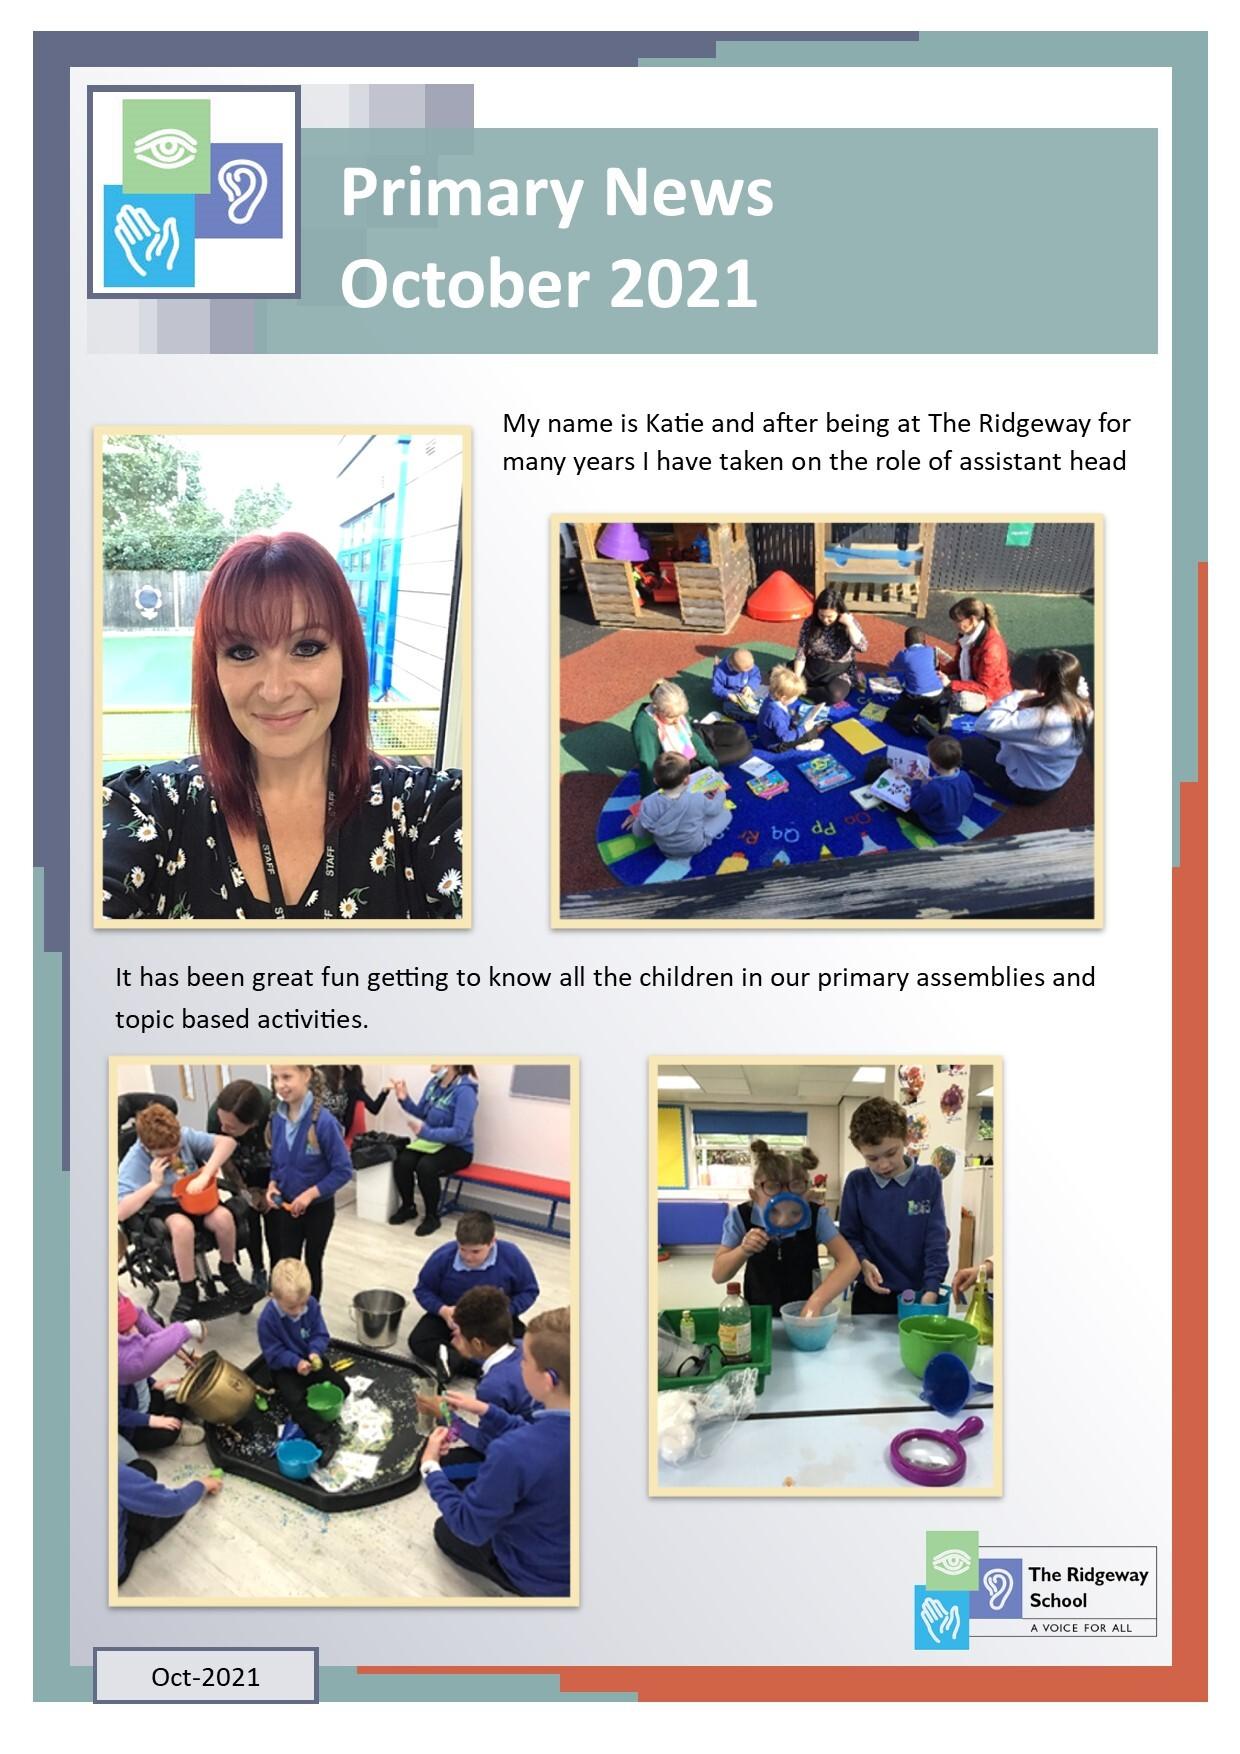 Primary News October 2021